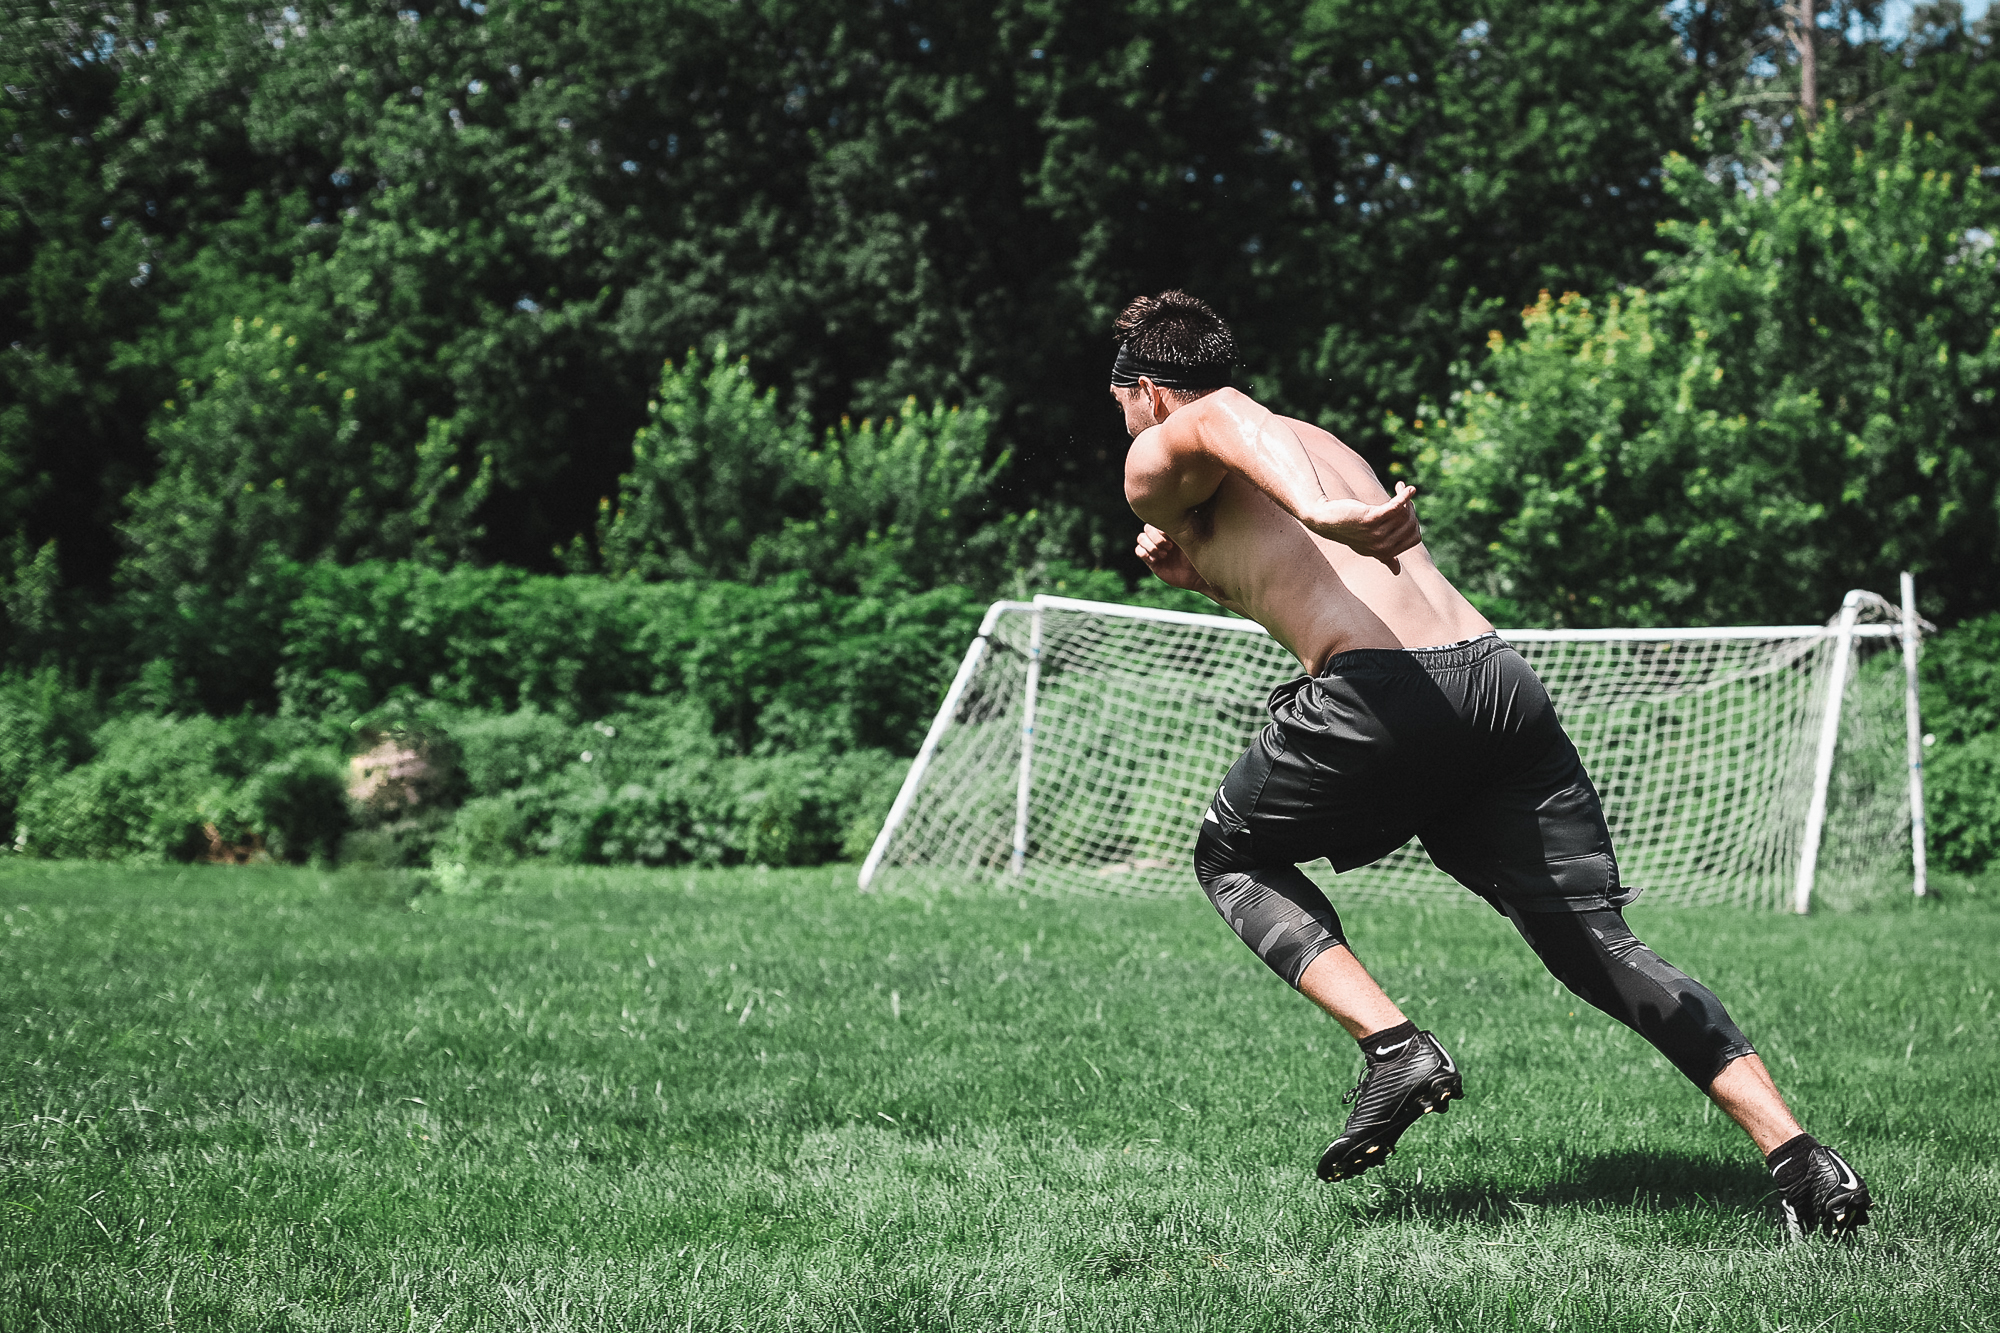 basciano-summer-training-2017-56.jpg